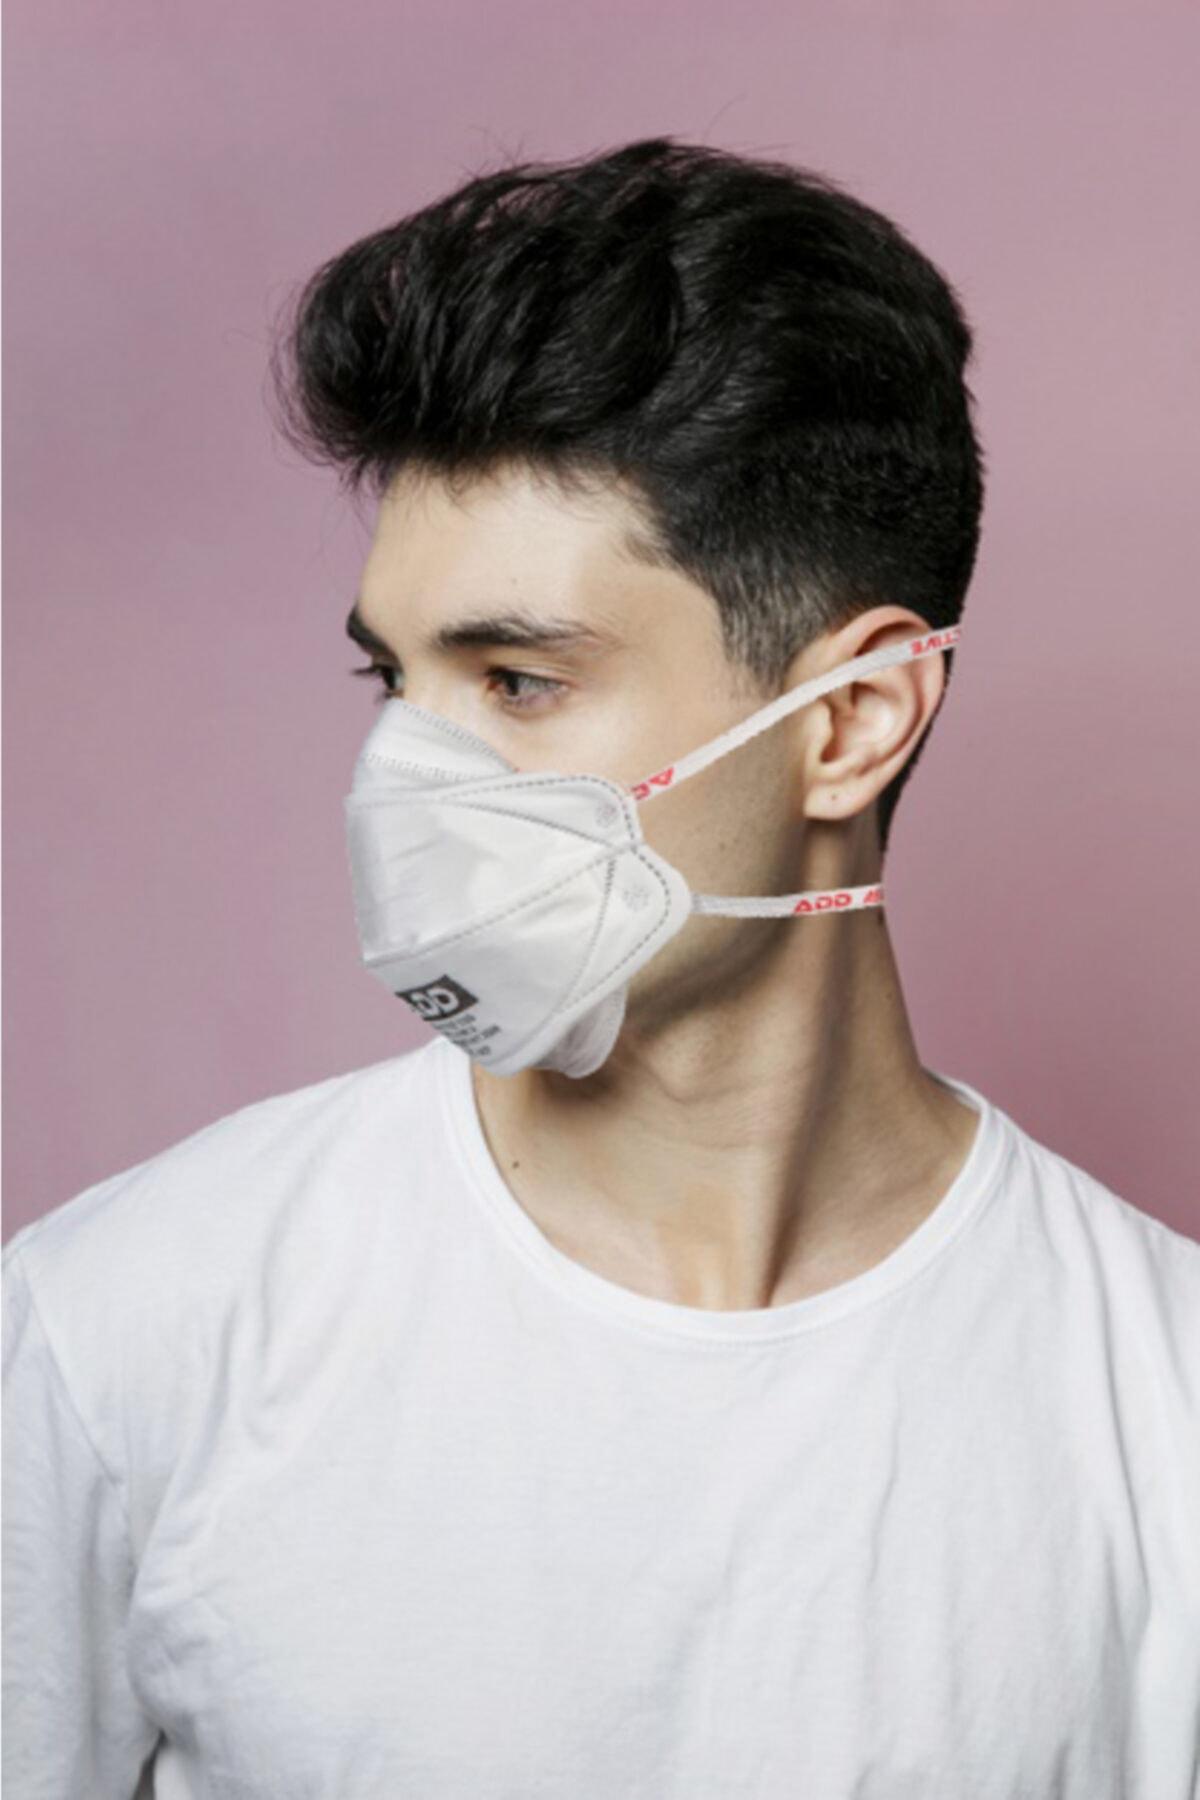 Add Aır Actıve 5500 N99 Ffp3 Maske (5 Adet)